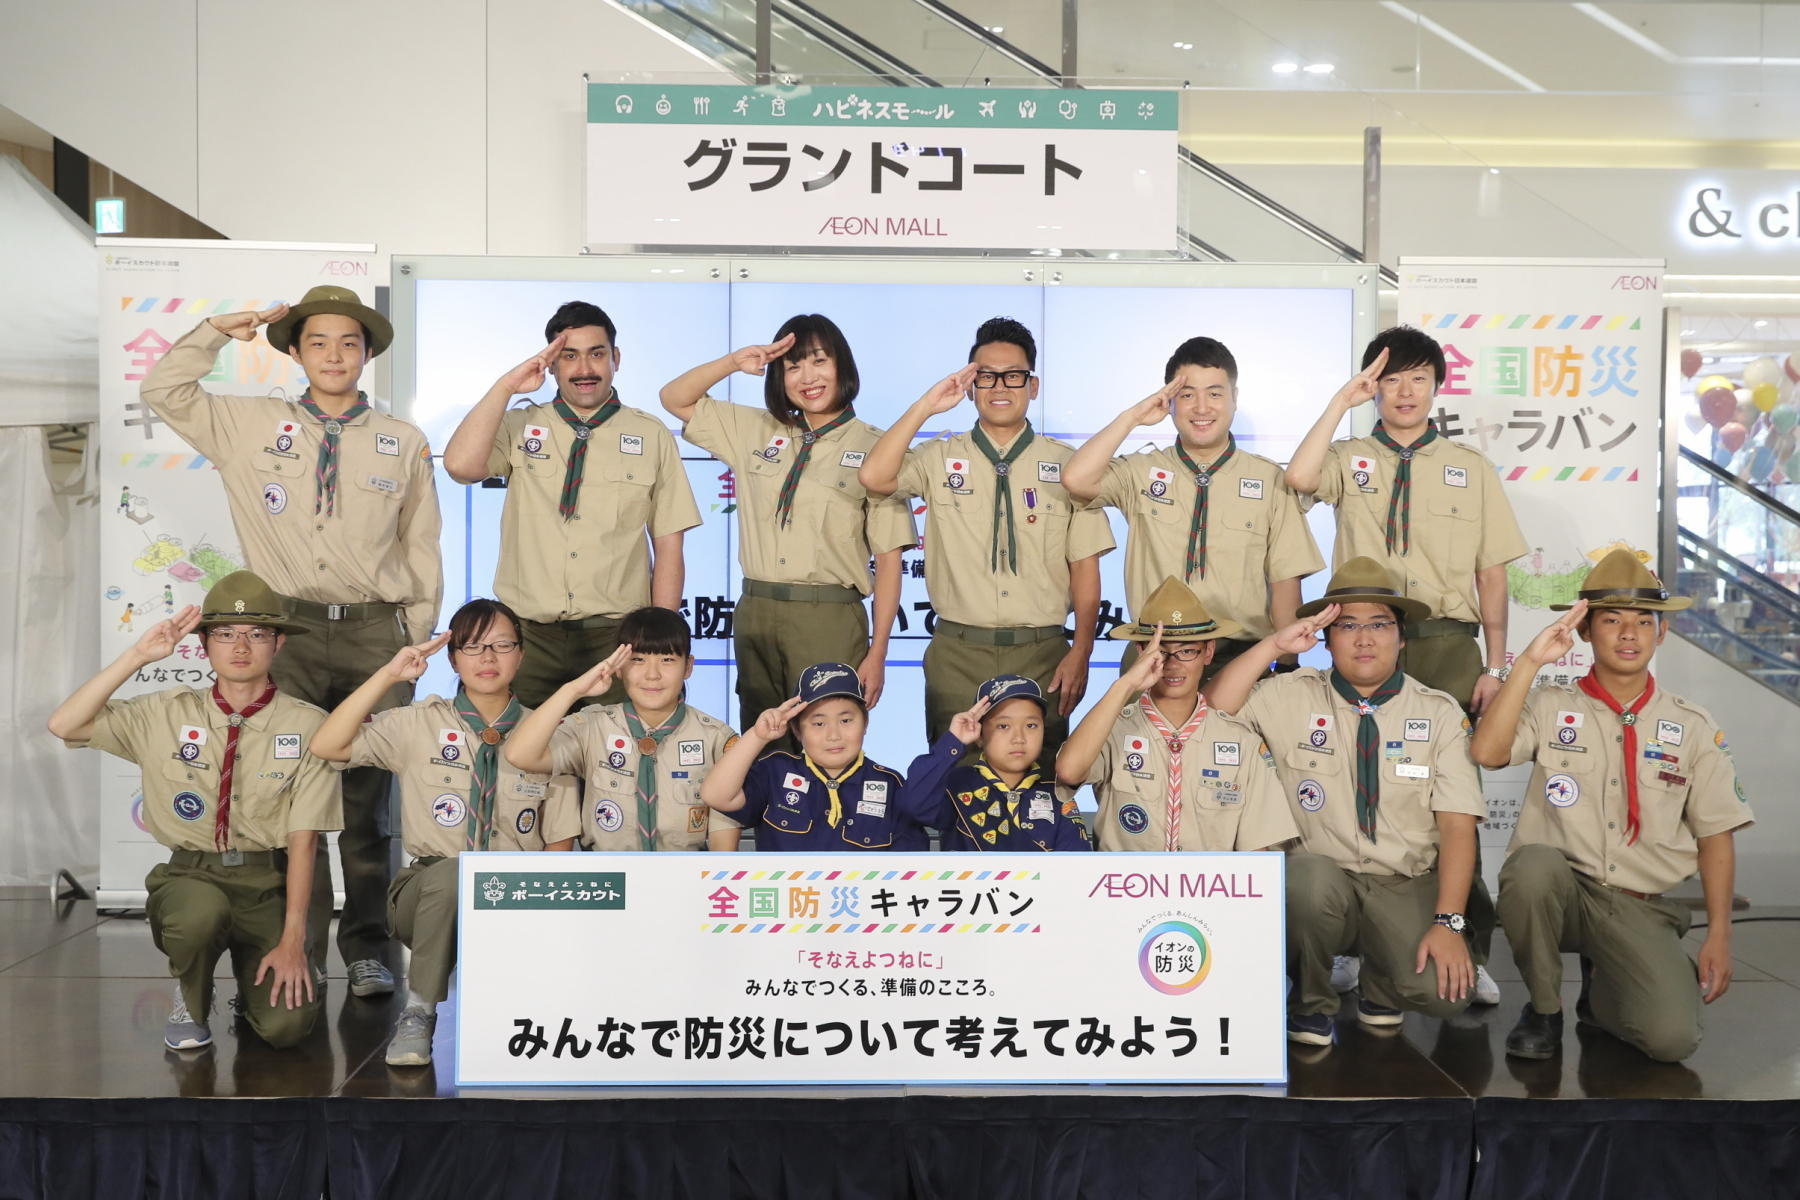 http://news.yoshimoto.co.jp/20180830173140-42a50e194f6e598189d4bb779502c9241c214362.jpg